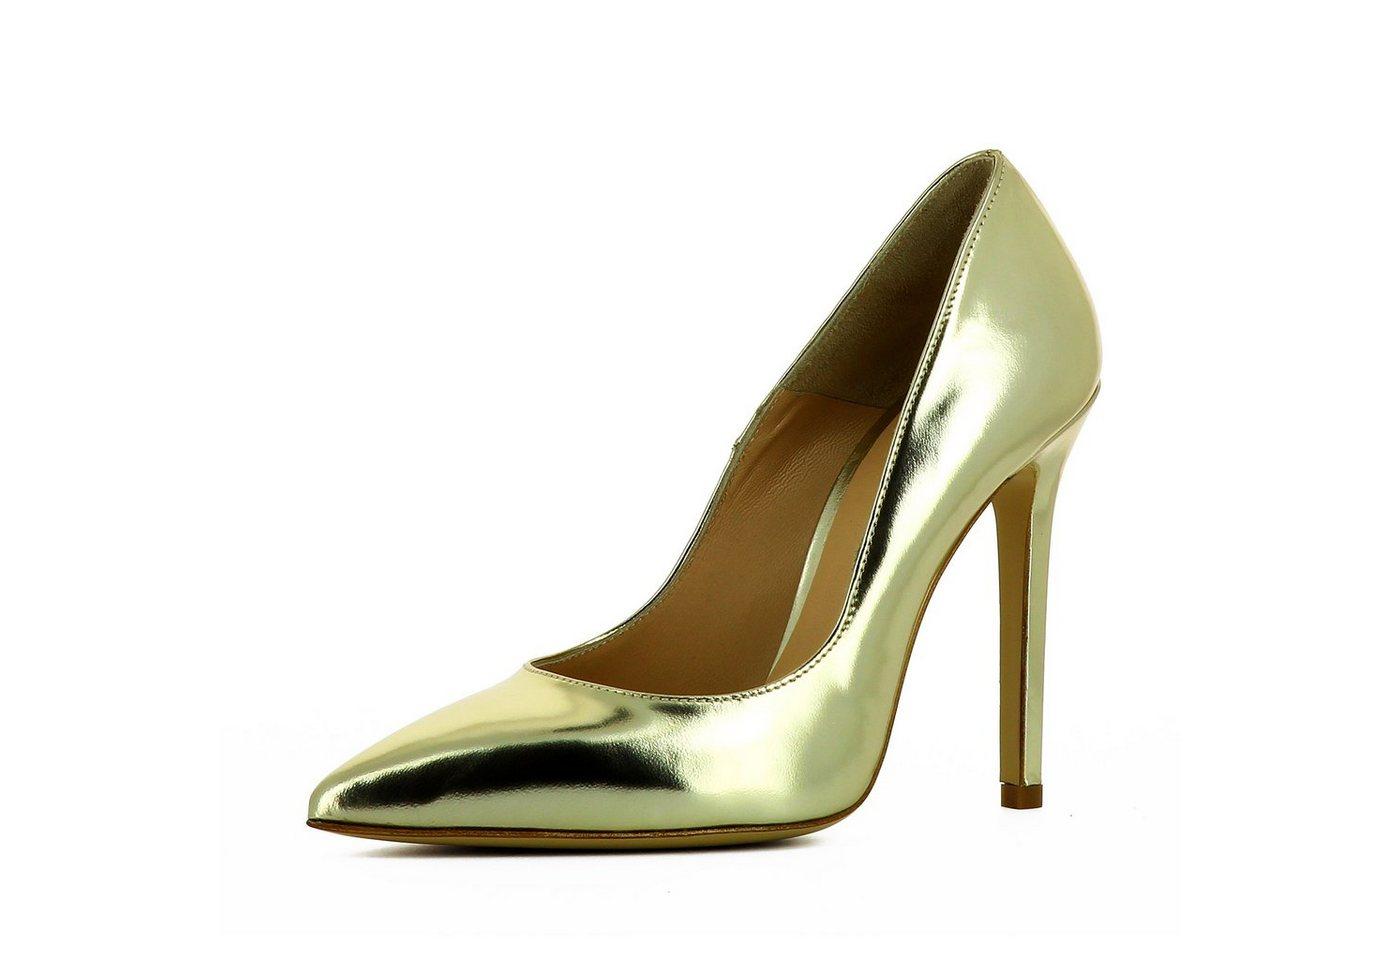 Evita »MIA« High-Heel-Pumps | Schuhe > High Heels | Goldfarben | Evita